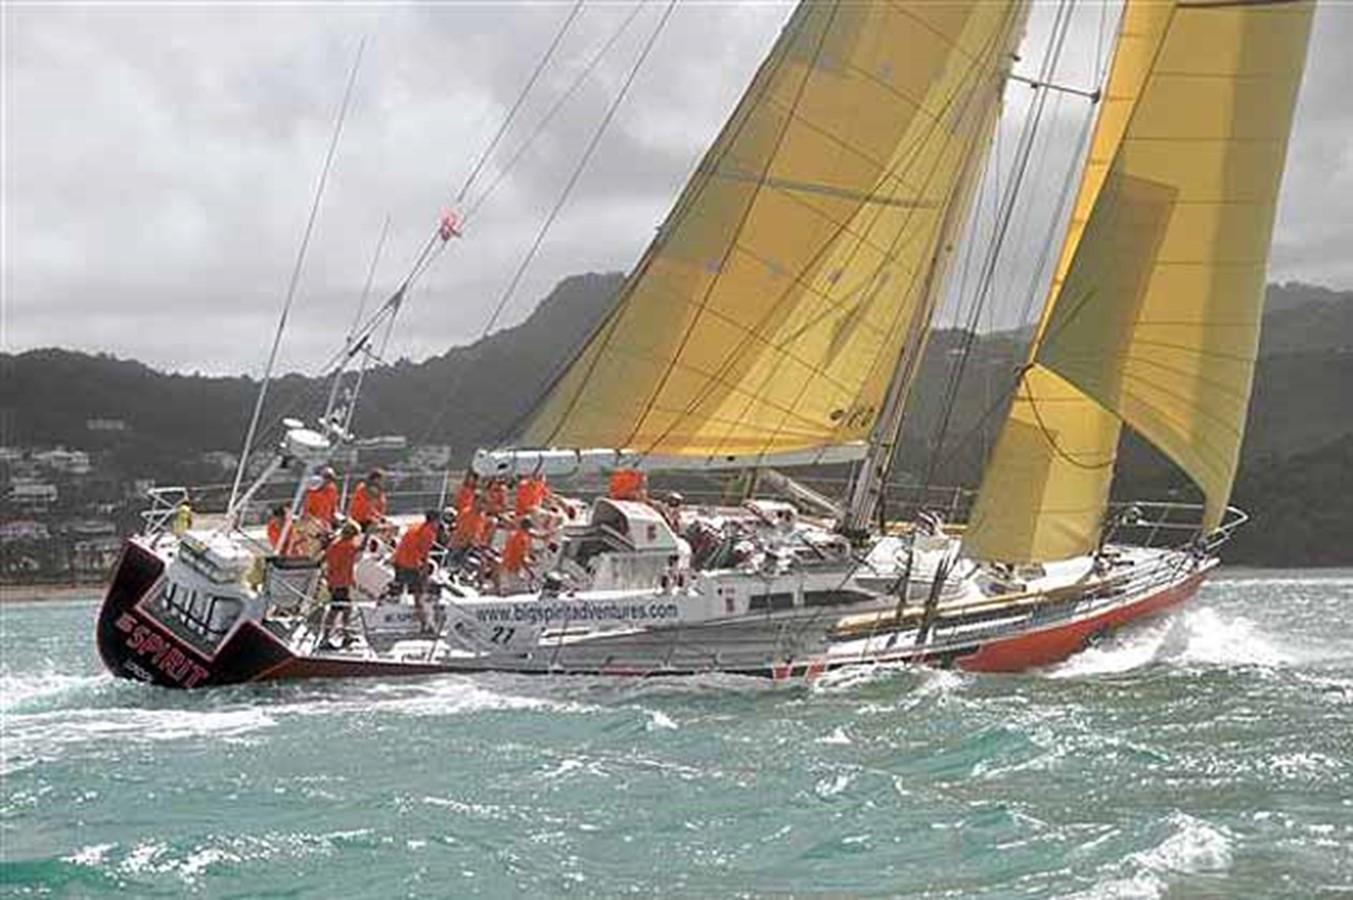 2000 DEVONPORT YACHTS Devonport Challenge 72 Cruising Sailboat 1516102